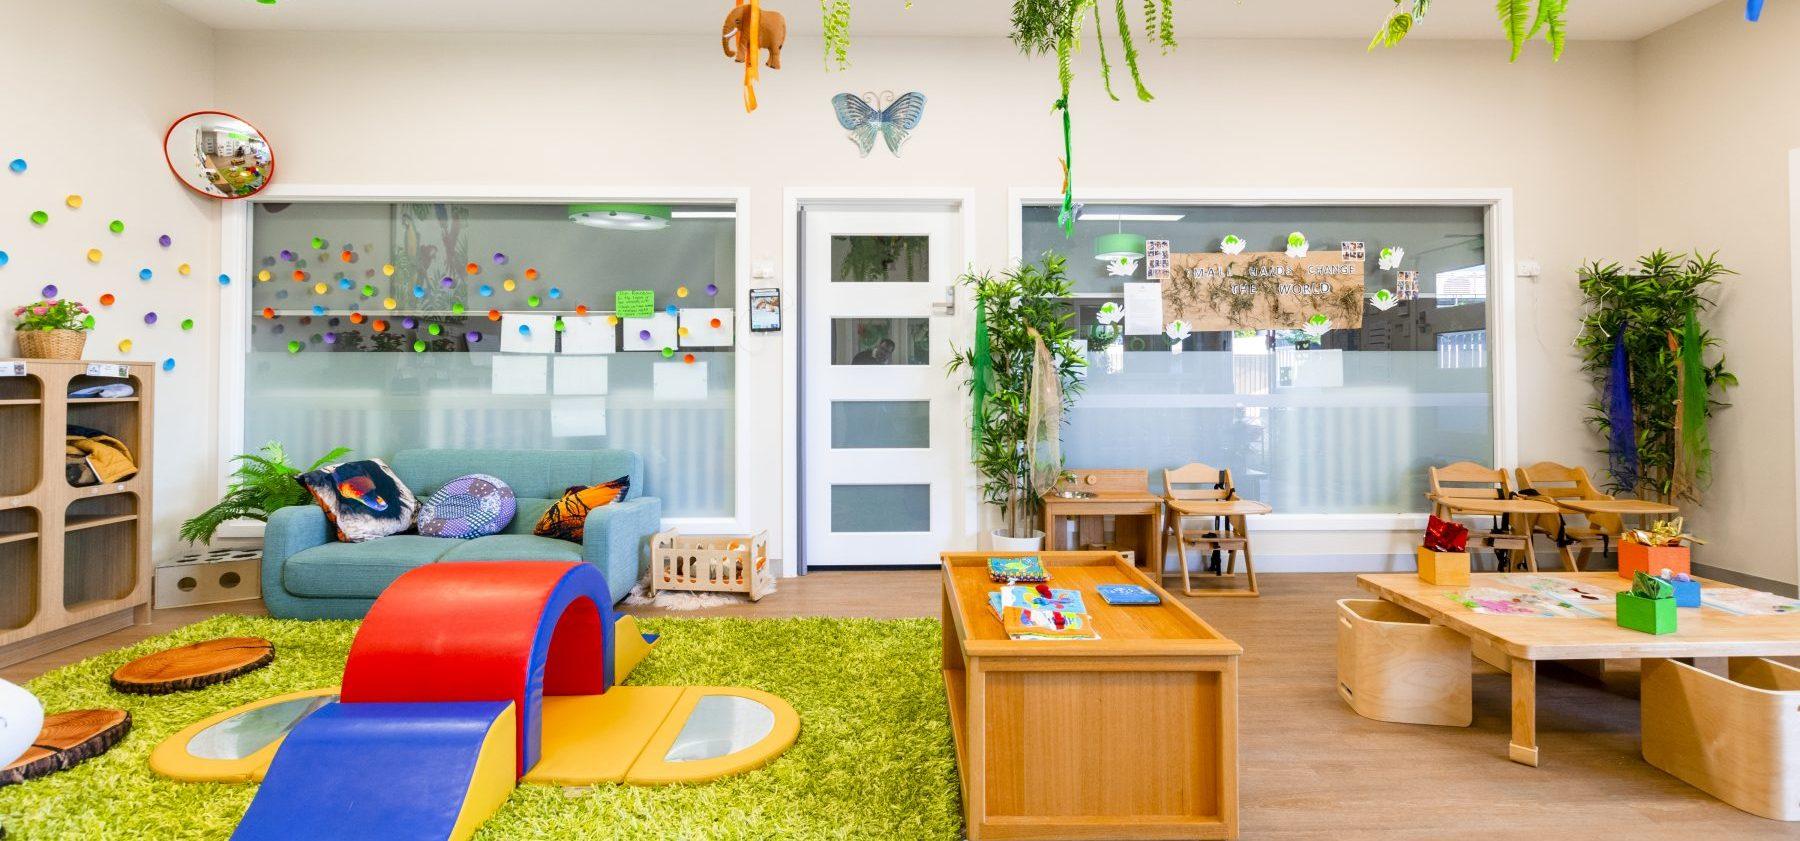 Handford Road Childcare Interior Play area